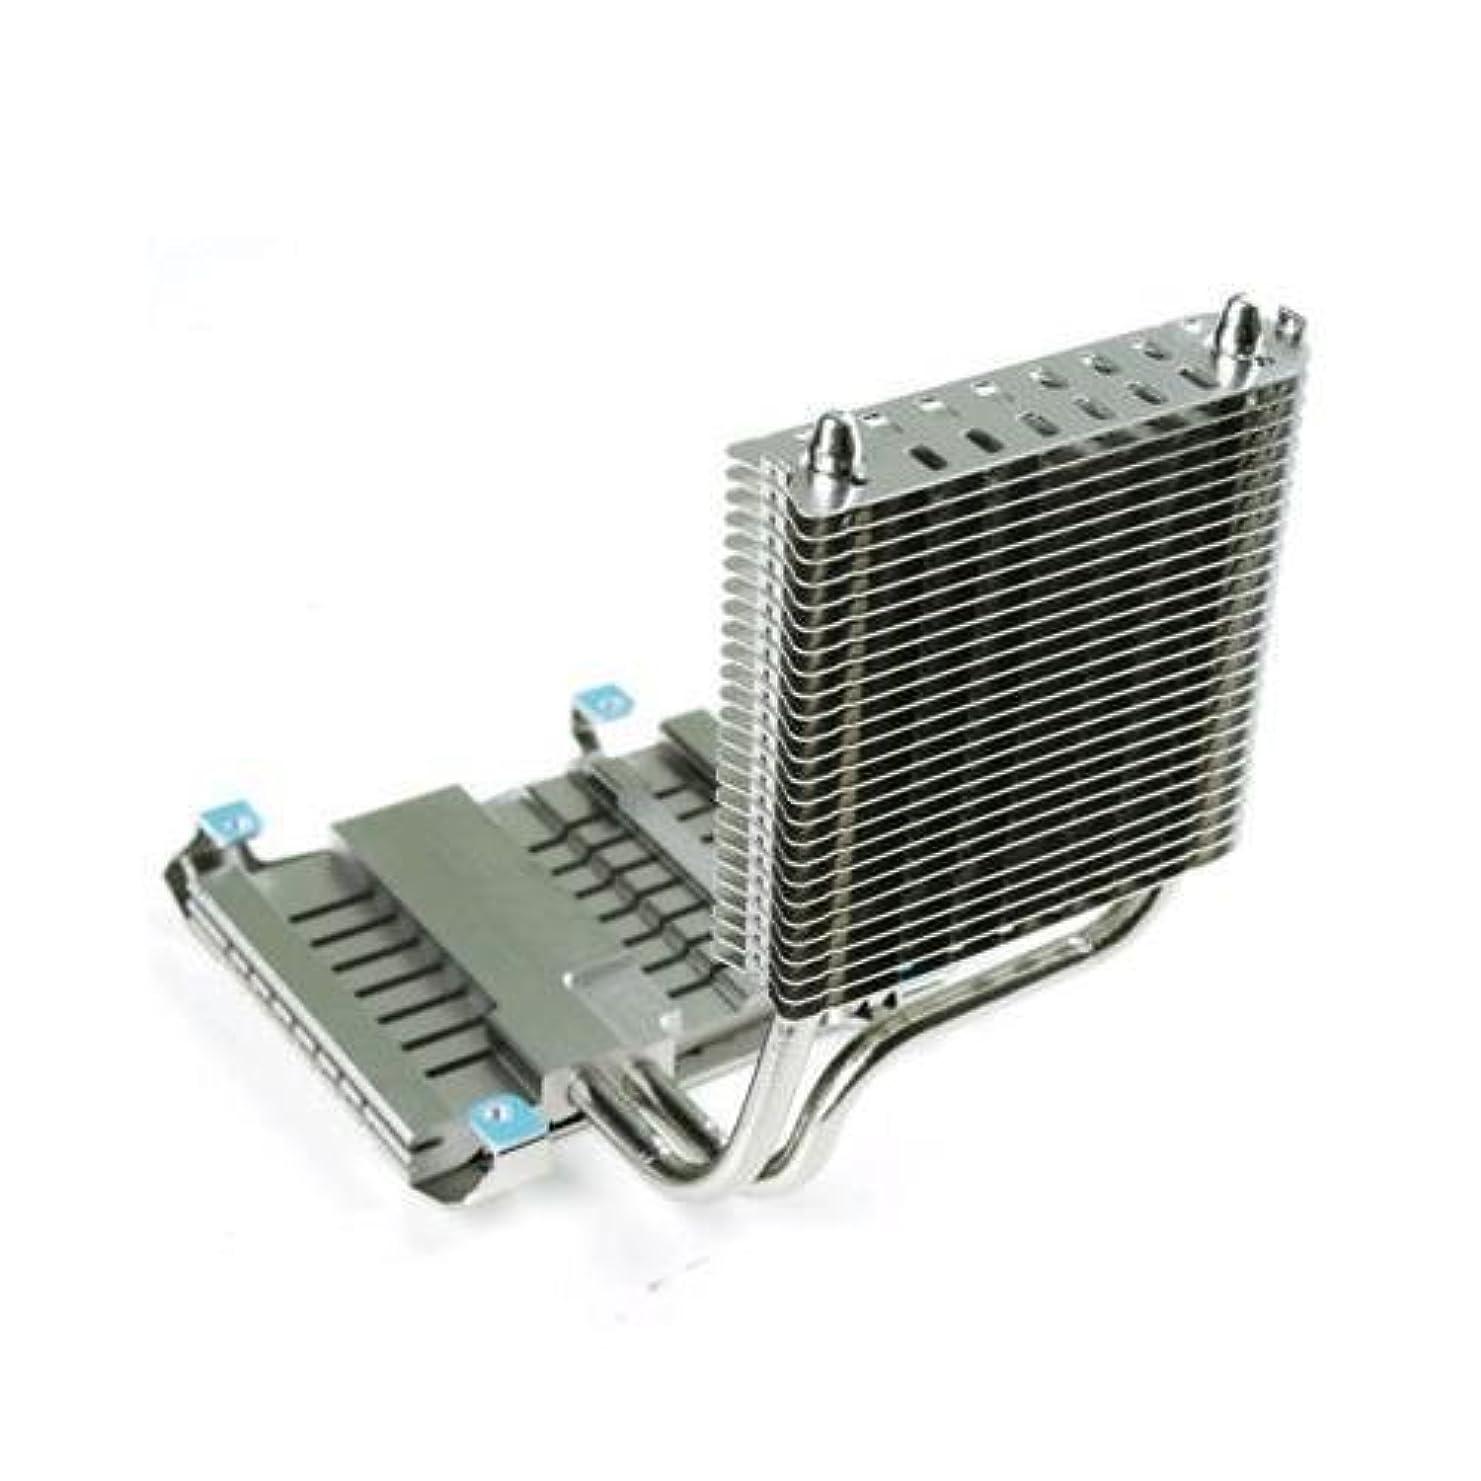 Thermalright TR-VRM-G1 VRM Solution Heatsink for Nvidia Referenced GTX285 TRVRMG1